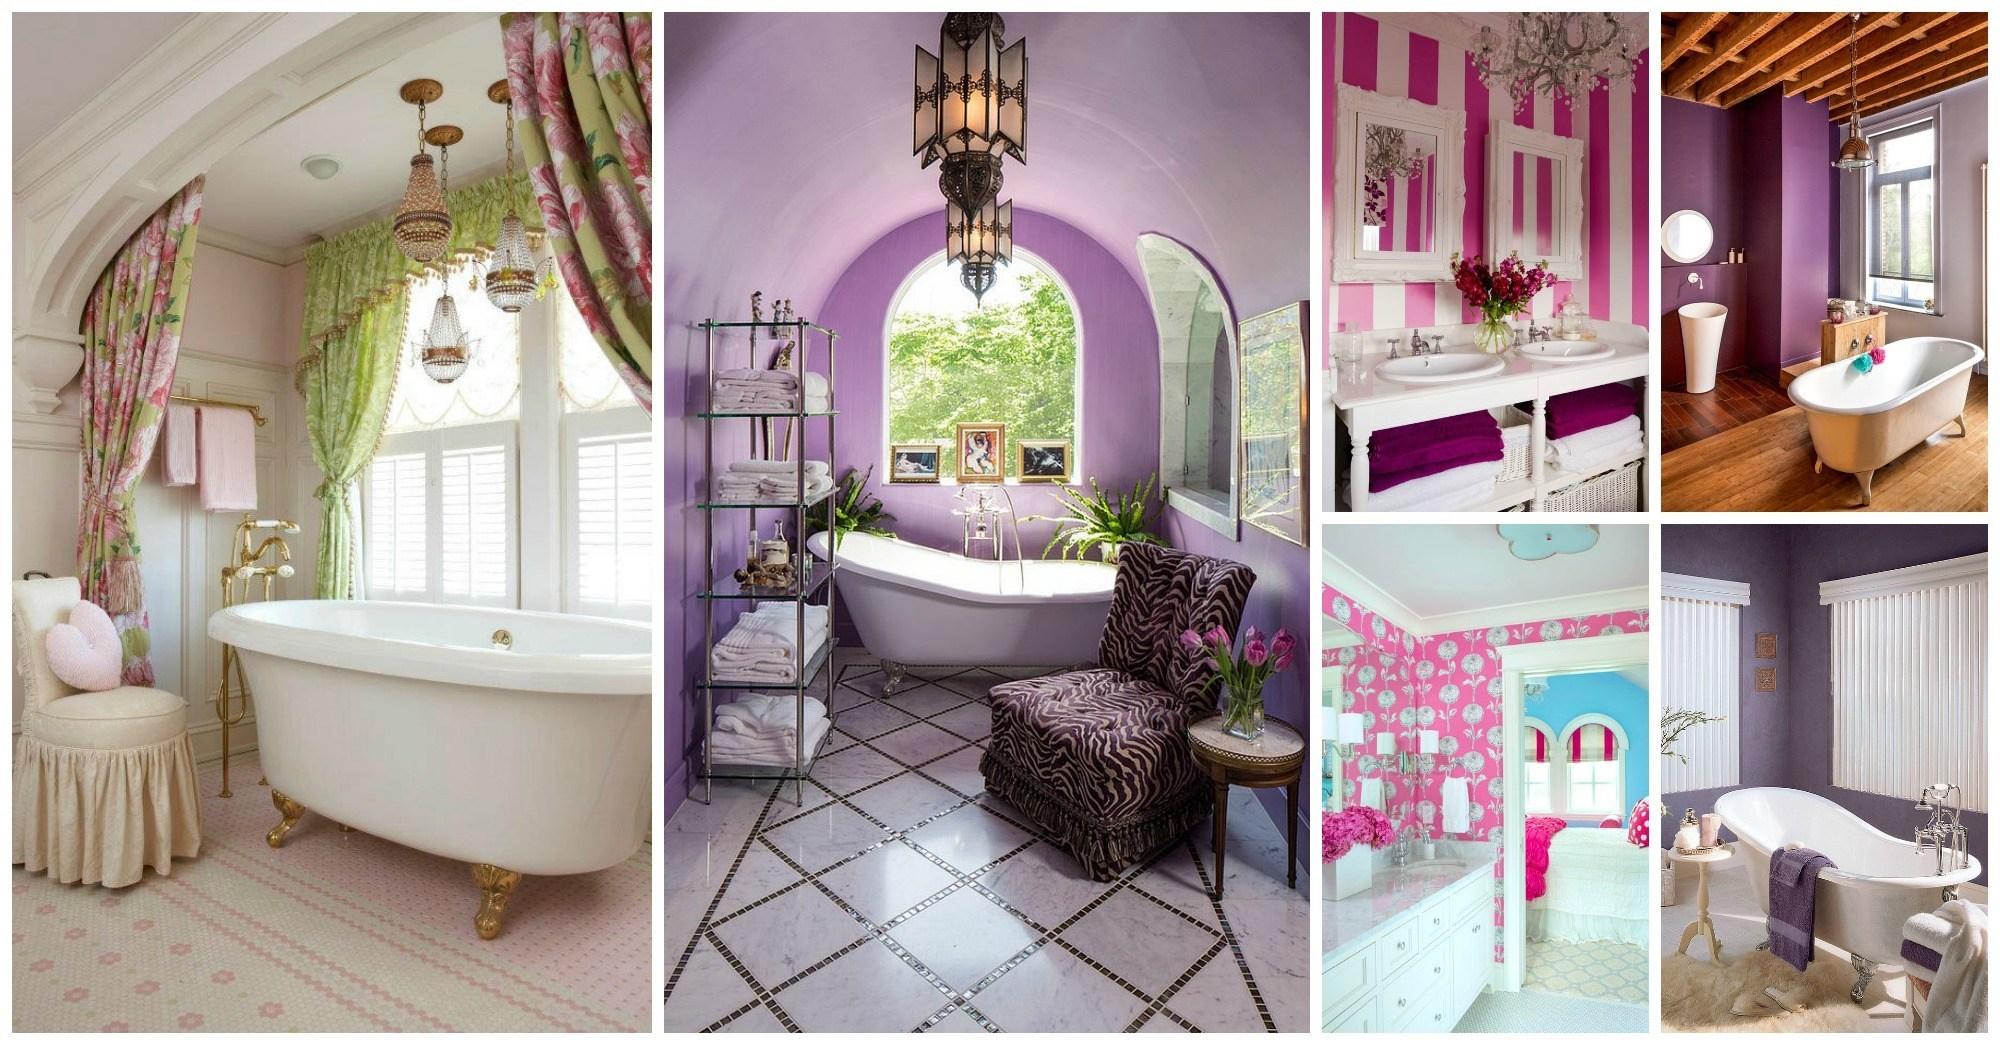 Feminine Bathroom Designs That Will Make You Say WoW